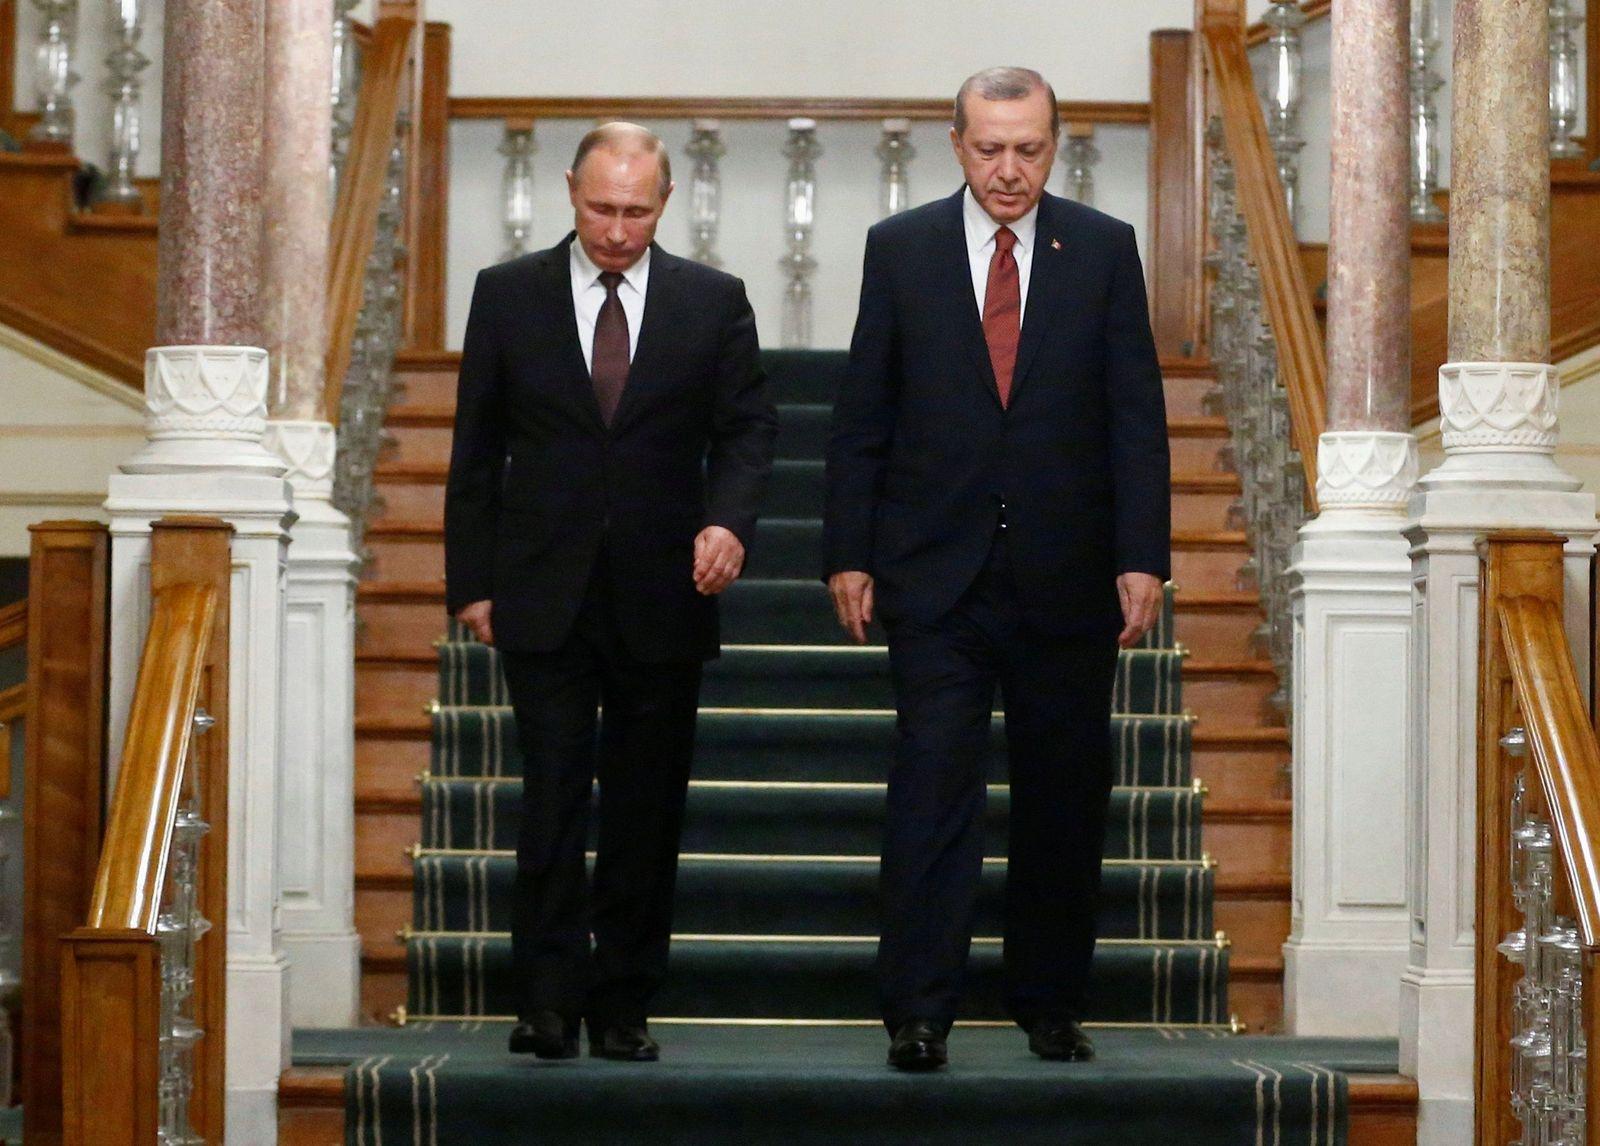 Wladimir Putin / Recep Tayyip Erdogan